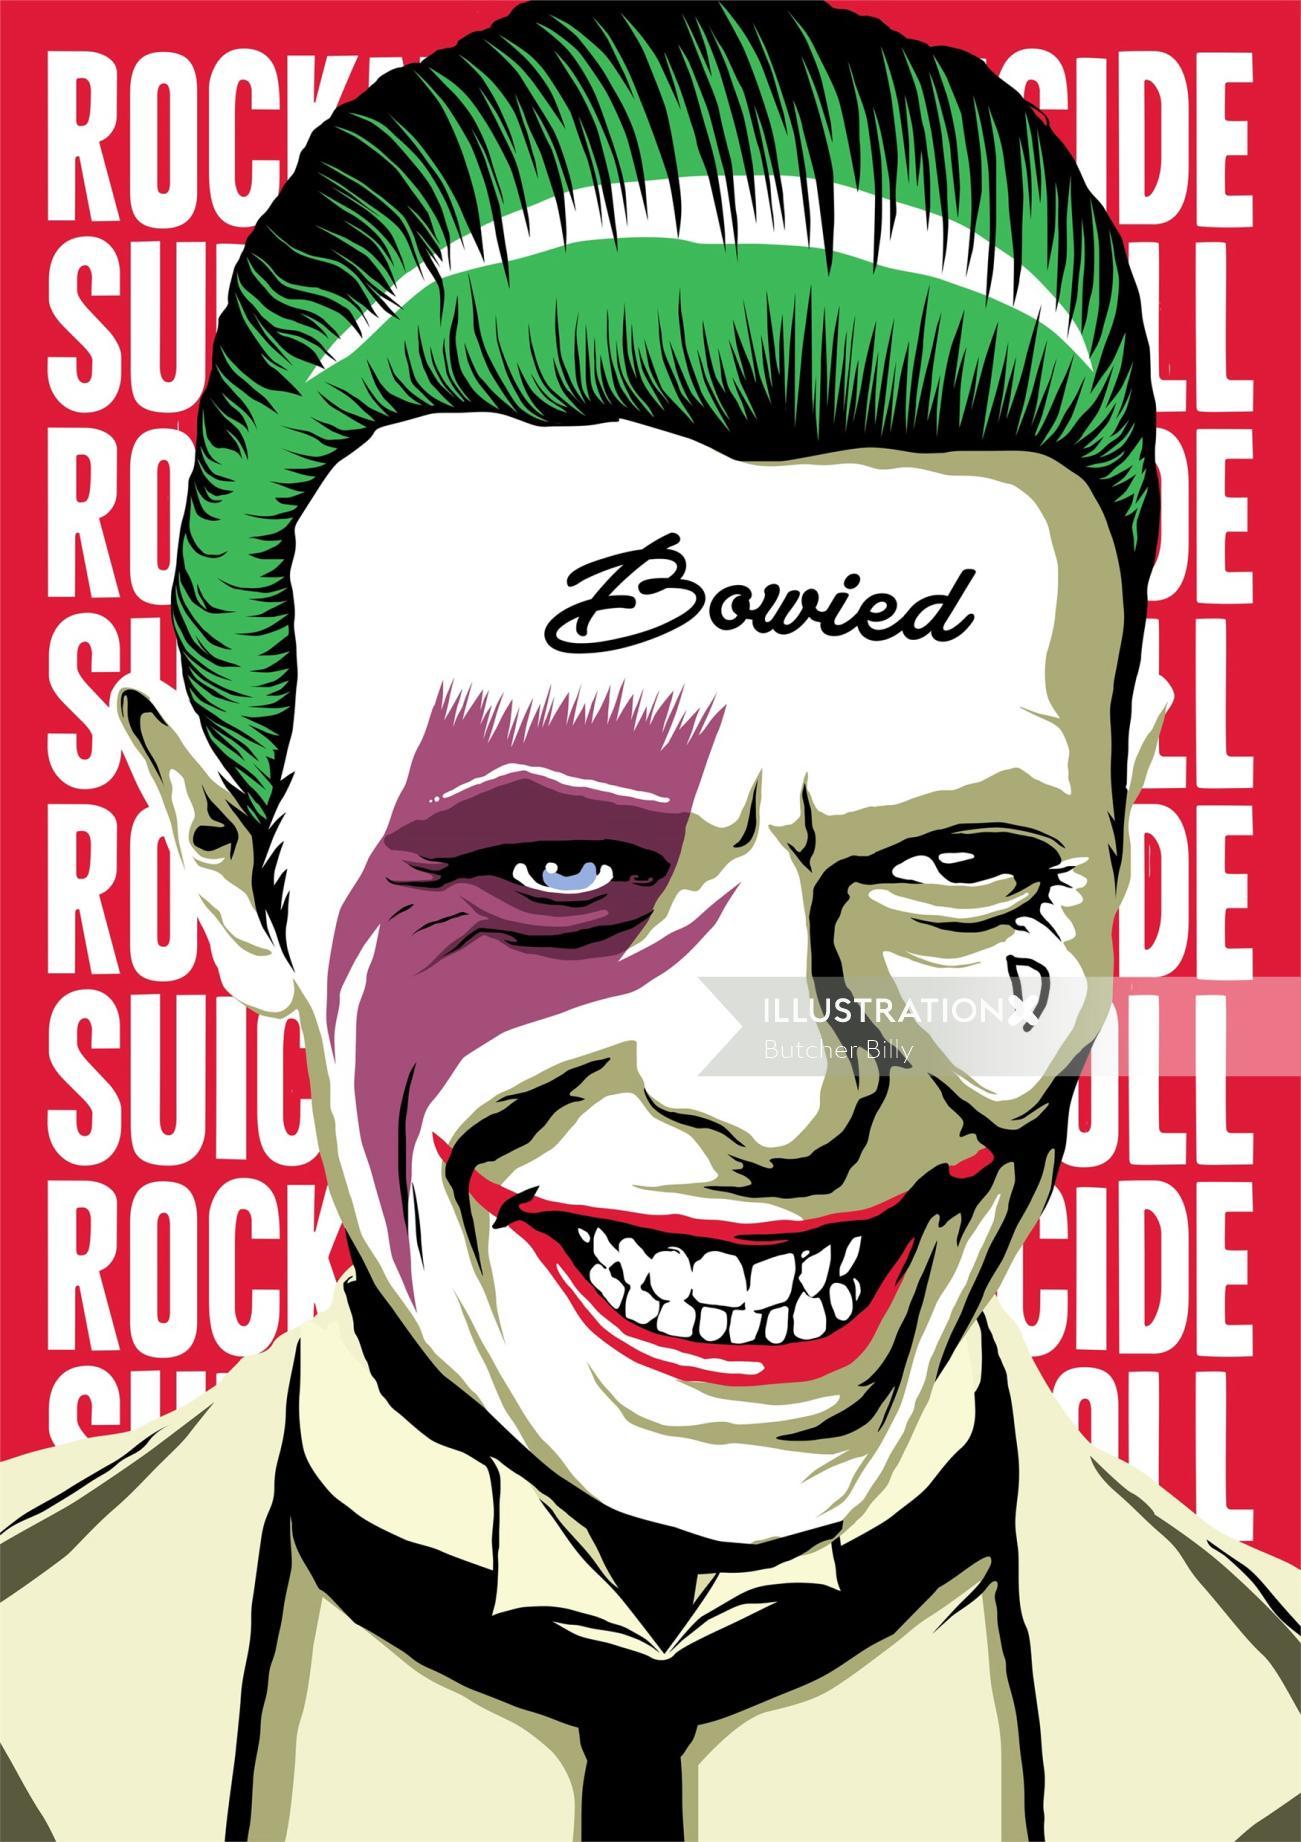 Joker art by Butcher Billy